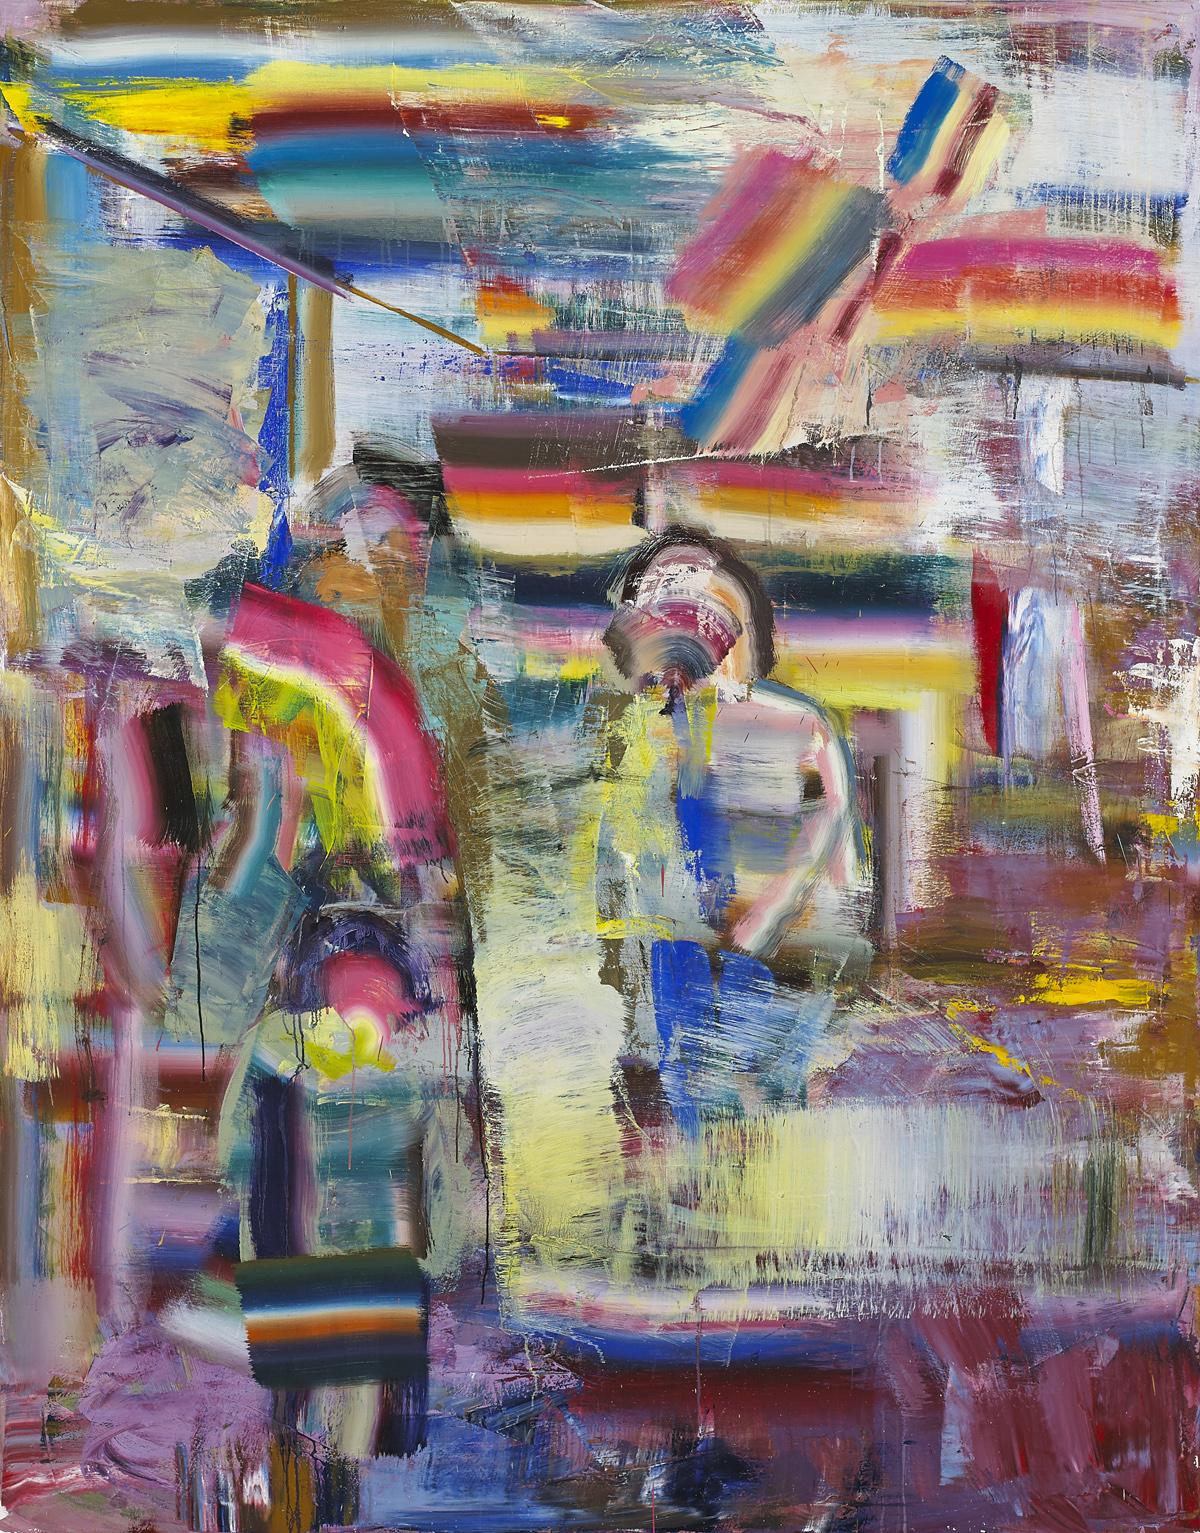 Diana Copperwhite, Weird Glamour, 2016, 230 x 180 cm (courtesy of 532 Gallery Thomas Jaeckel)